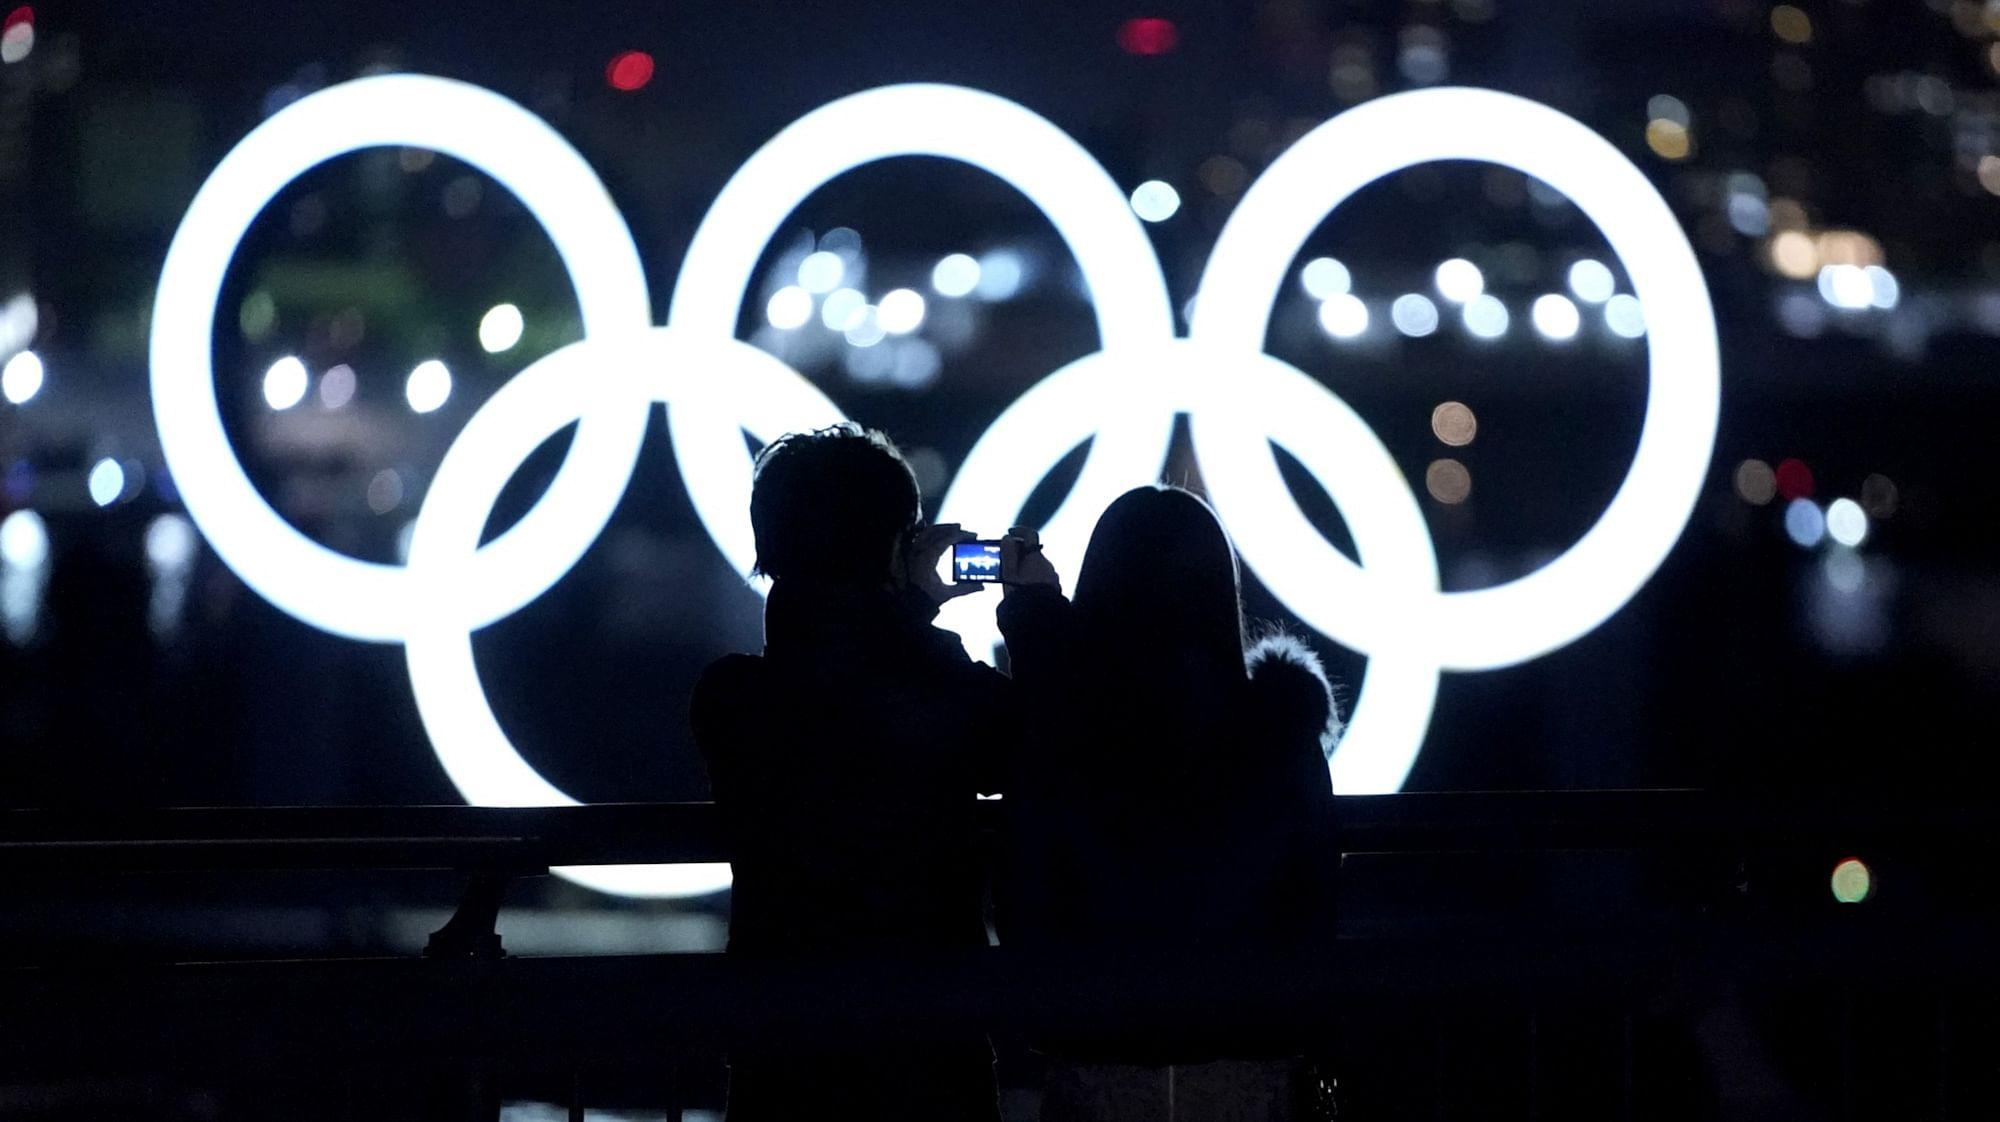 Covid-19 pandemic — Bangladesh lockdown triggers exodus, Tokyo Olympics 'difficult' now - ThePrint